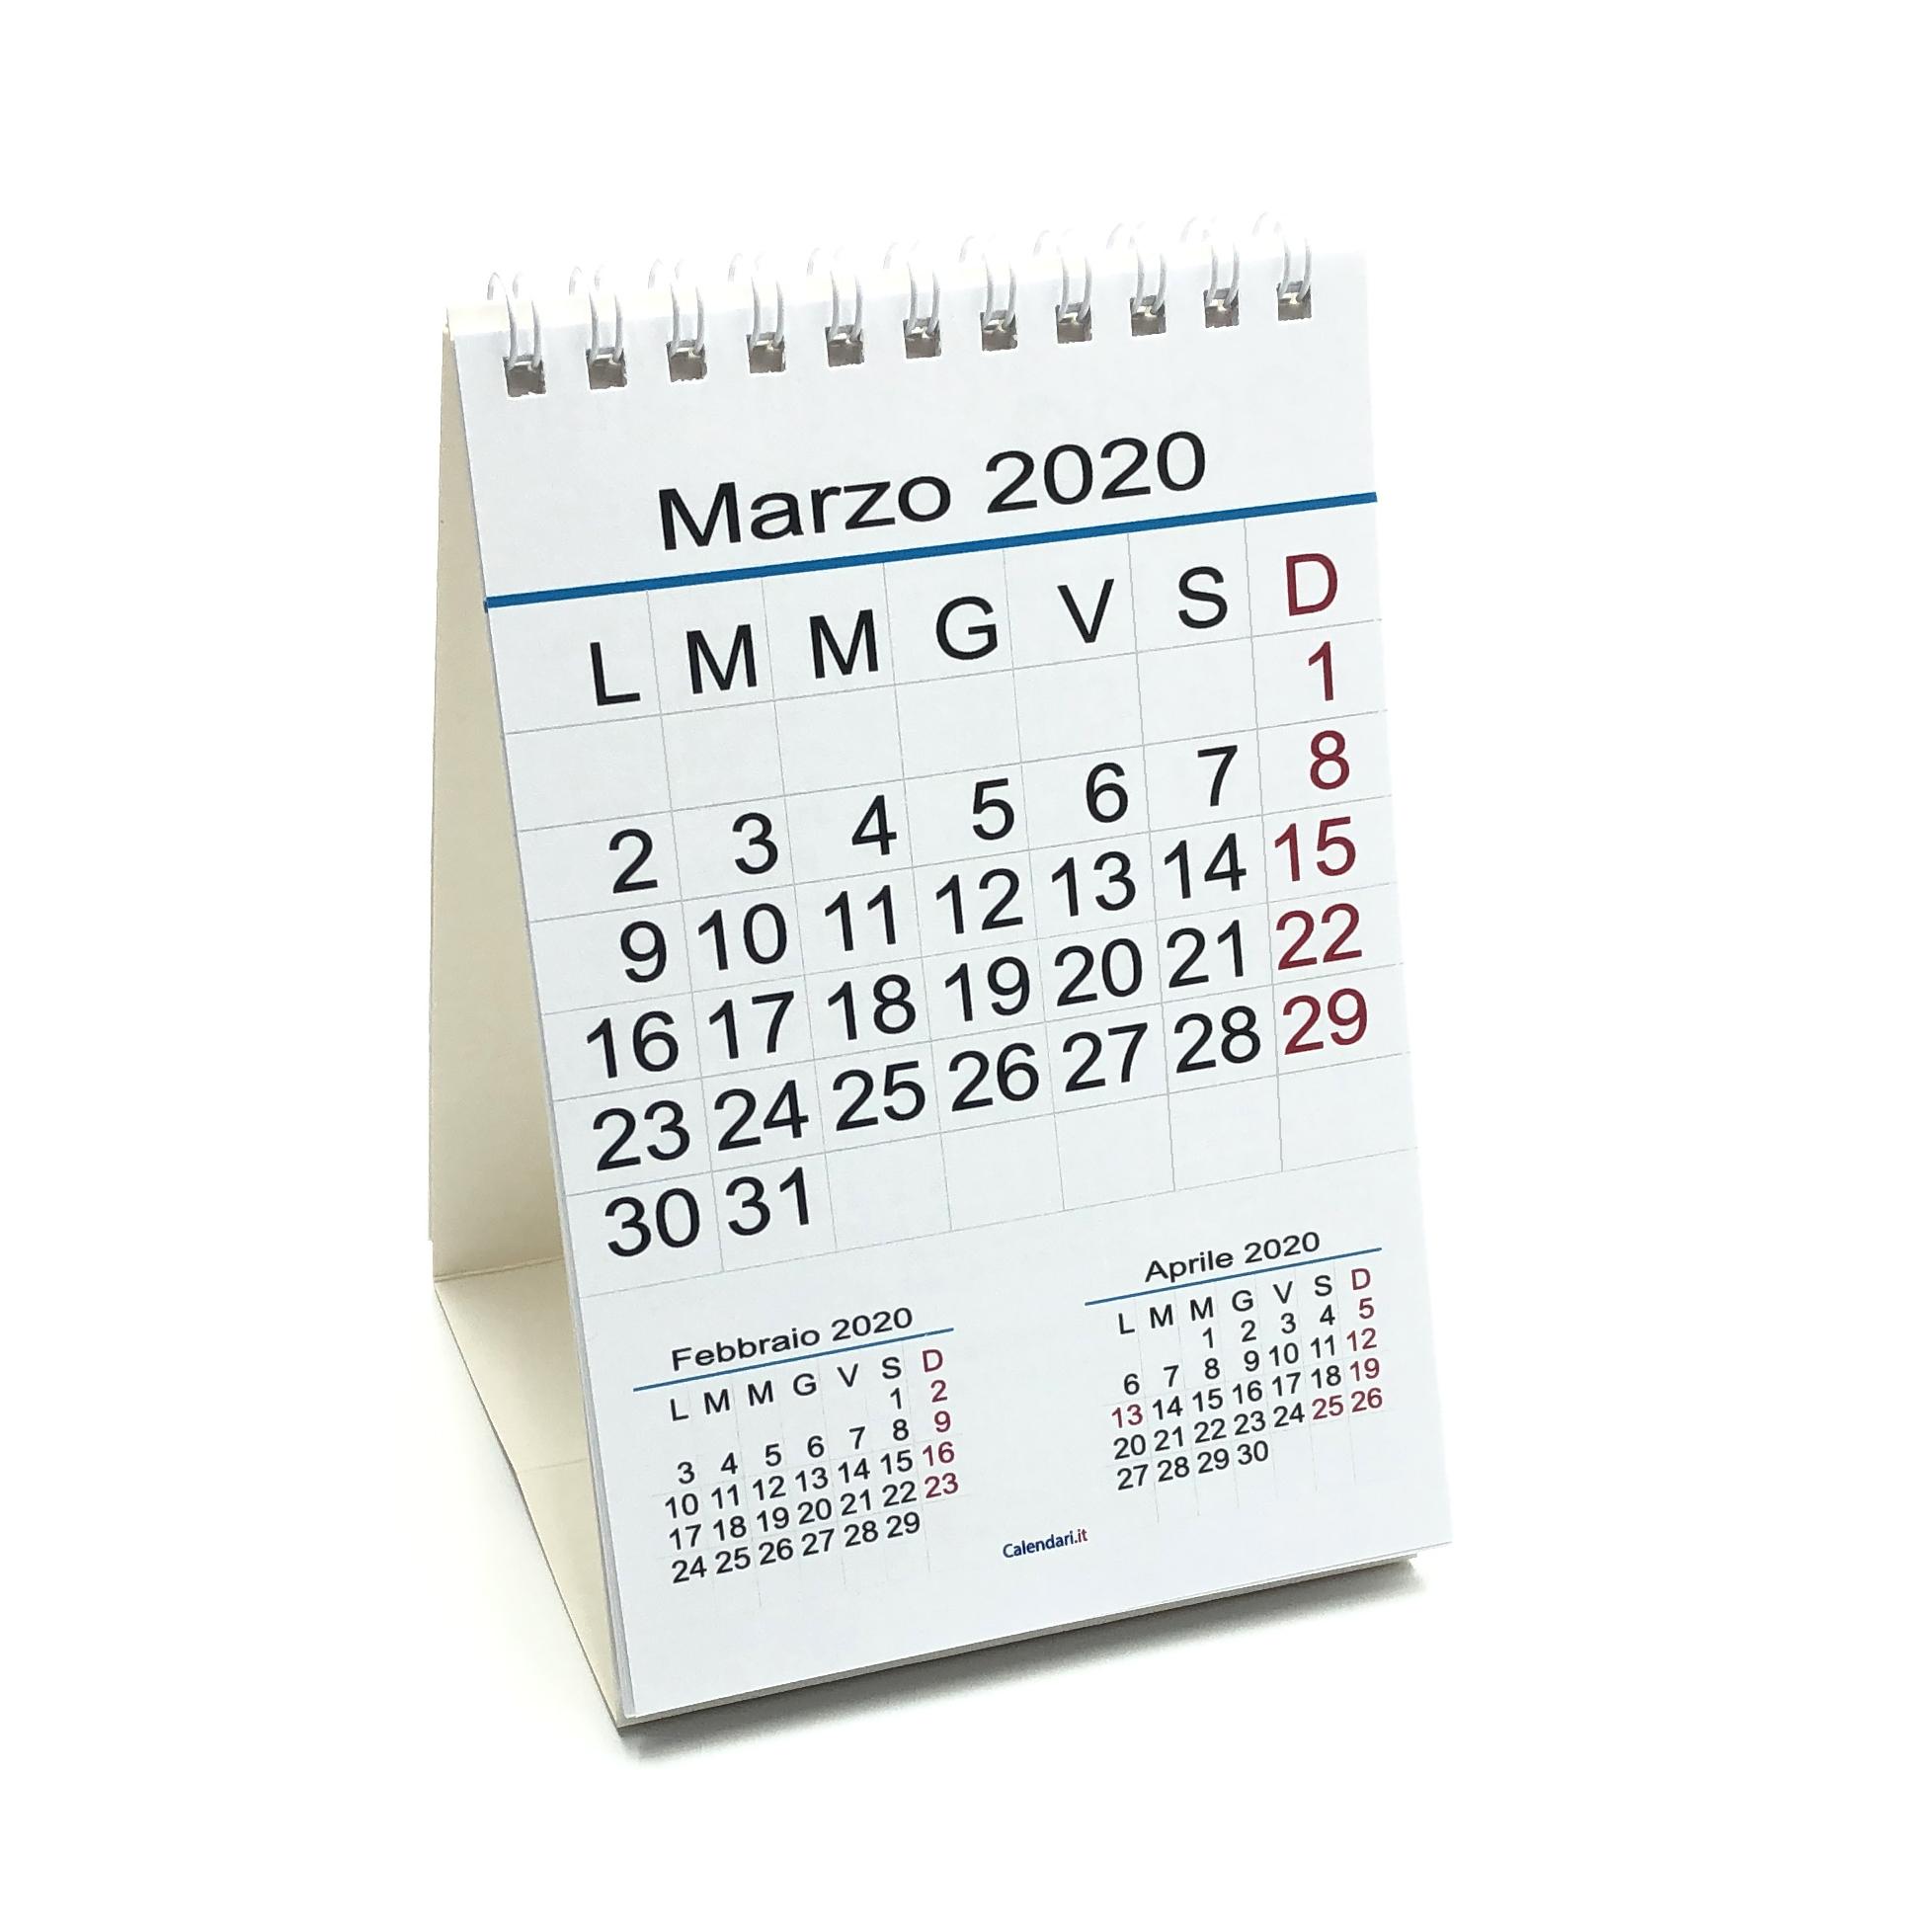 Calendario Febbraio Marzo 2020.Calendario 2020 Tavolo Numeri Grandi 3 Mesi 10x15 Cm